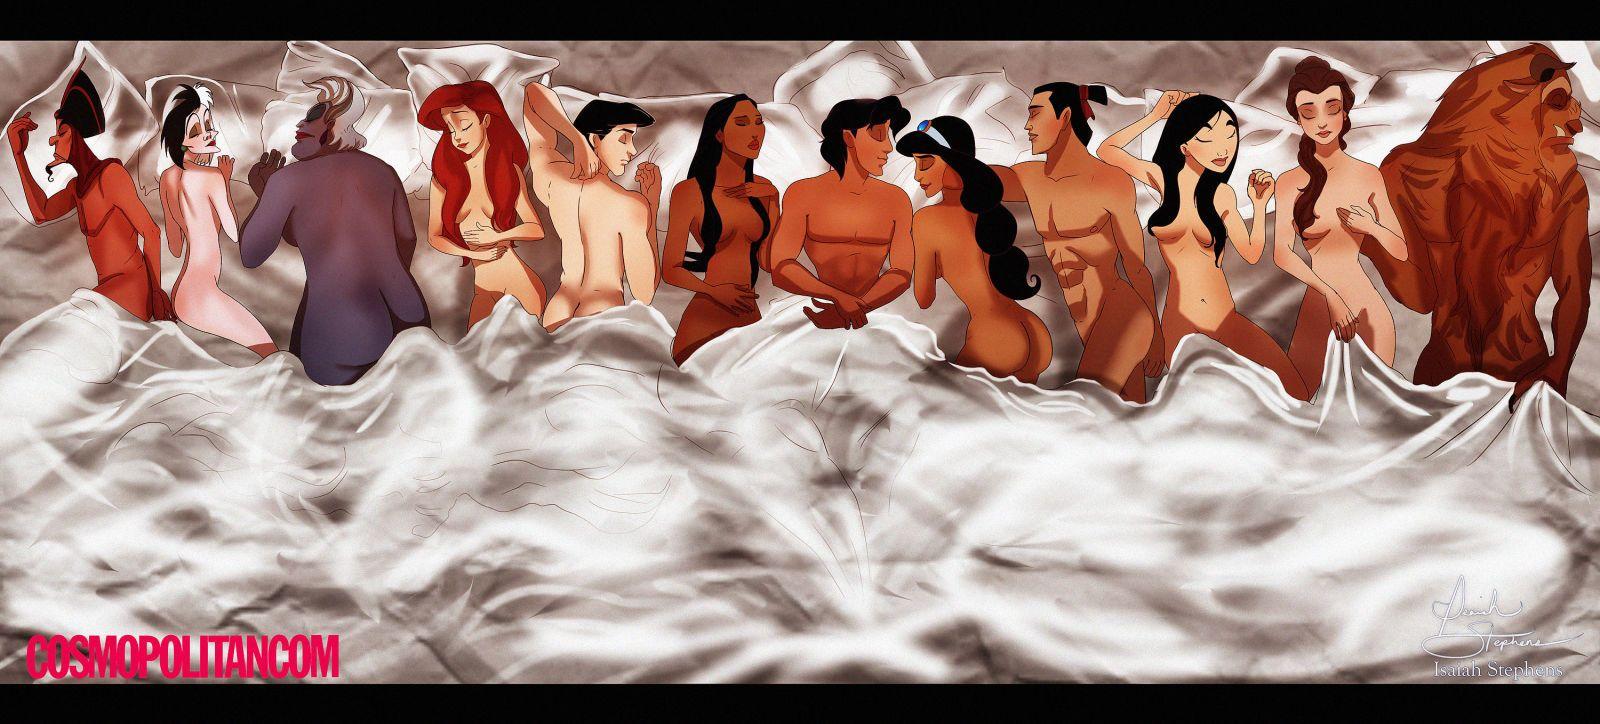 if kanye west cast disney princesses in famous philosophy